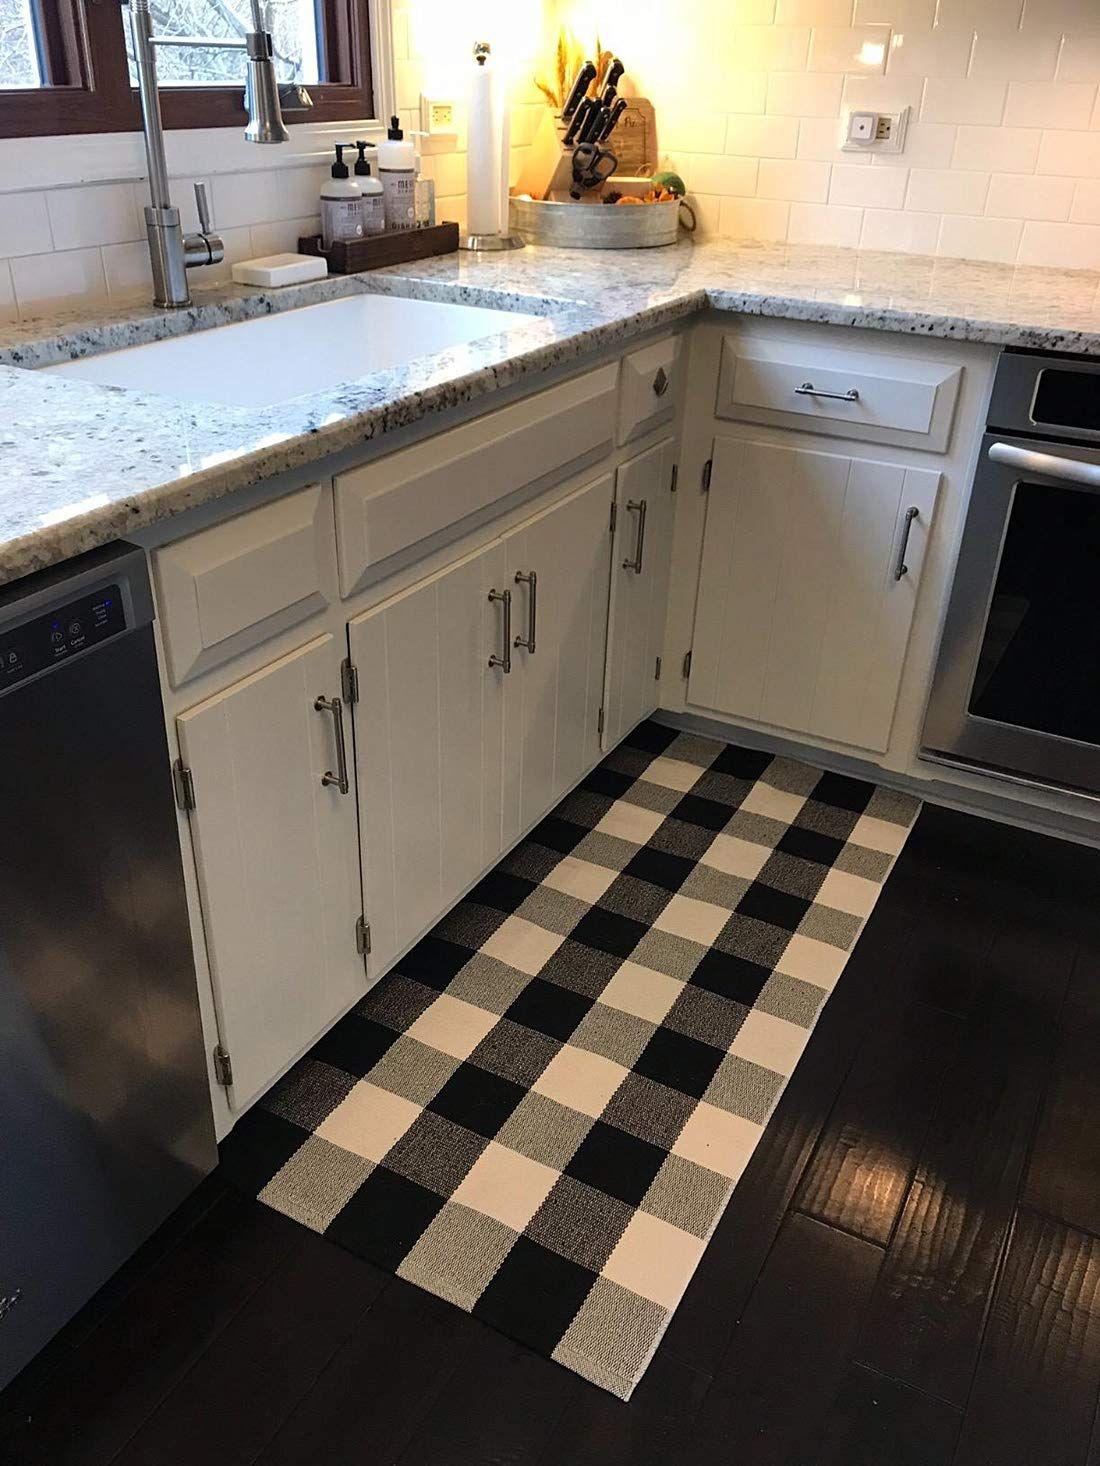 Amazon Com Ukeler Buffalo Check Rug Black And White Plaid Rugs Cotton Hand Woven Checkered Car Checkered Kitchen Decor Buffalo Plaid Decor Home Decor Kitchen